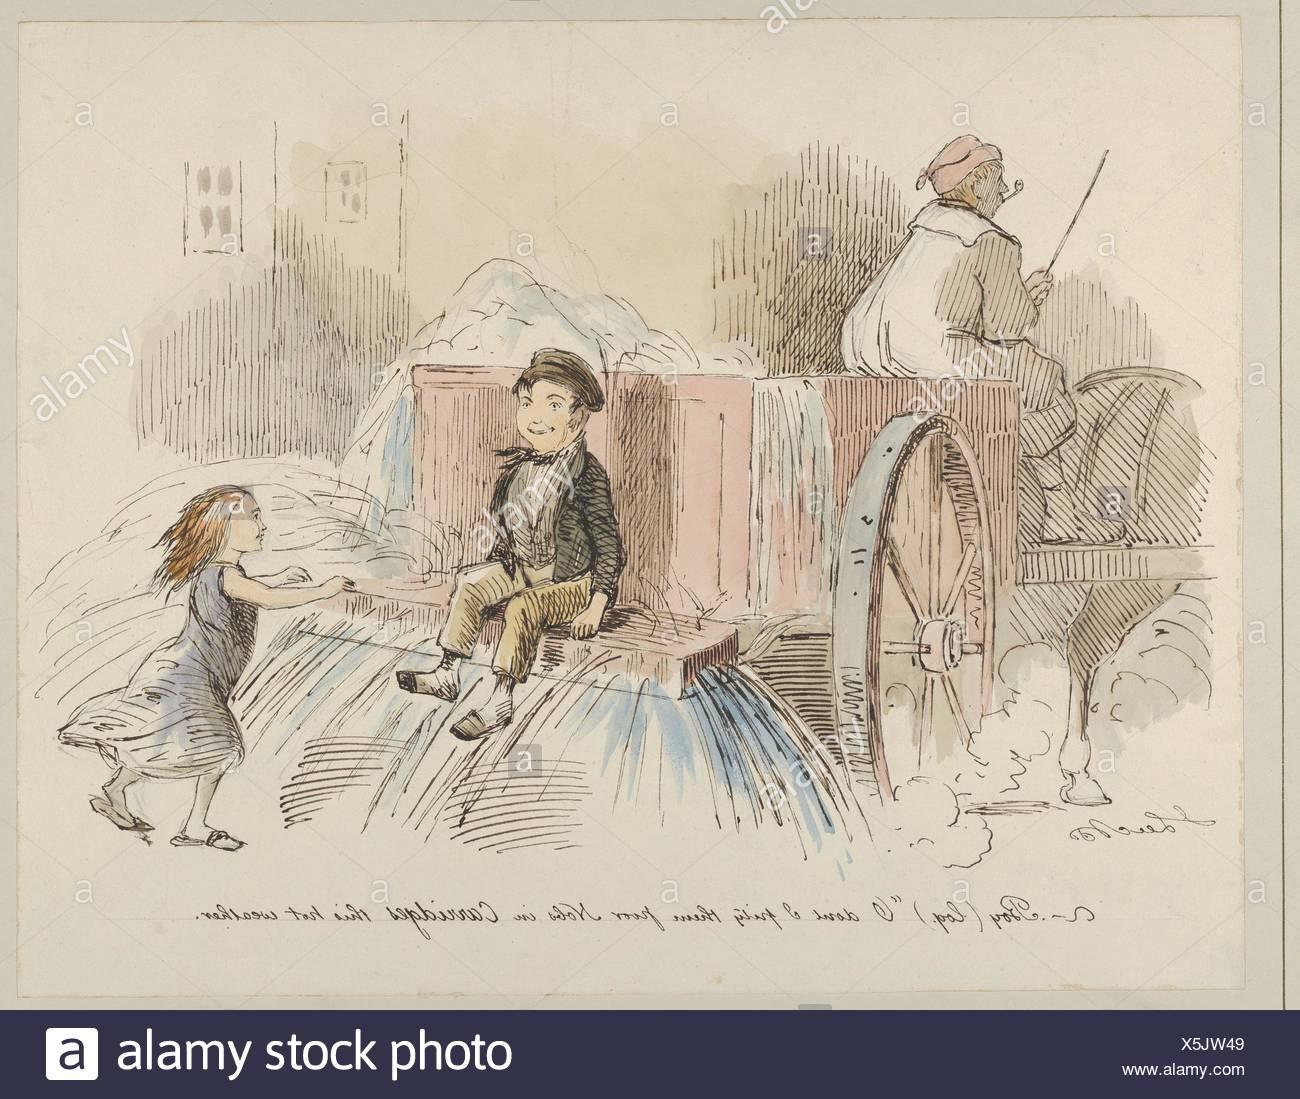 Boy (LOQ). O no me dan lástima pobre Nobs en carruajes este clima caliente. Artista: John Leech (Británicos, Londres Londres 1817-1864); Fecha: 1830-64; media: Imagen De Stock